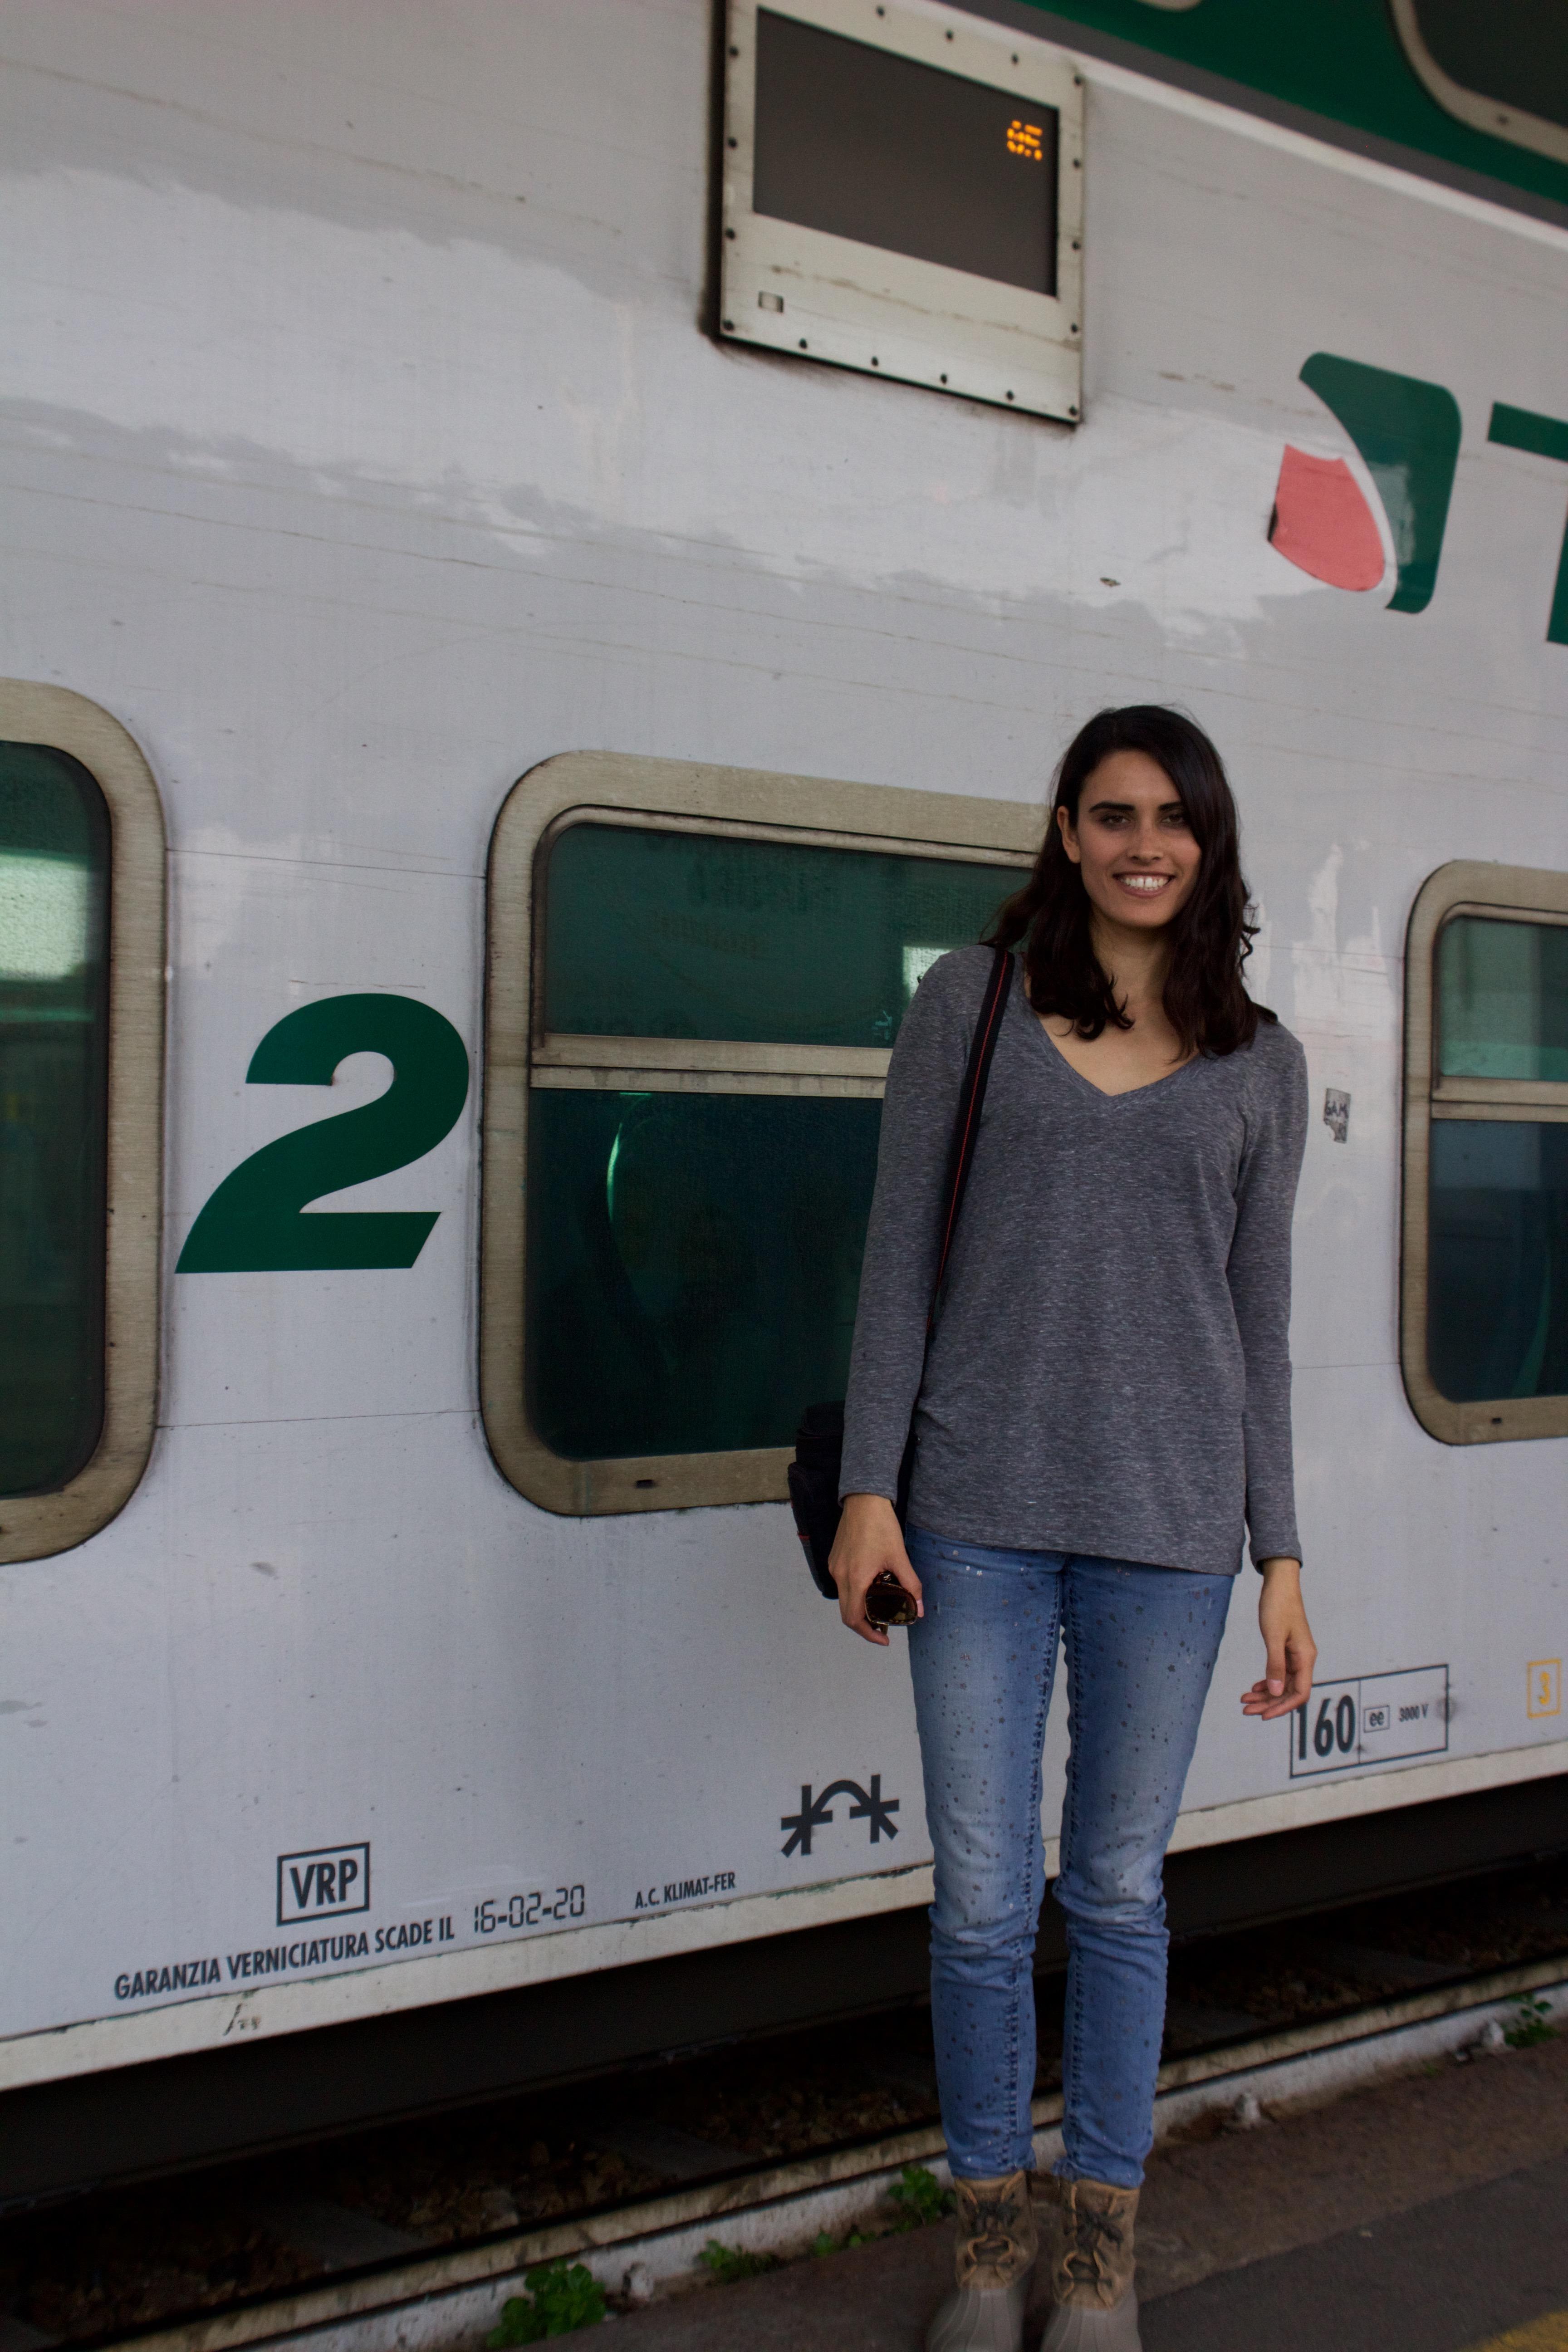 Trenitalia from Bergamo to Milano